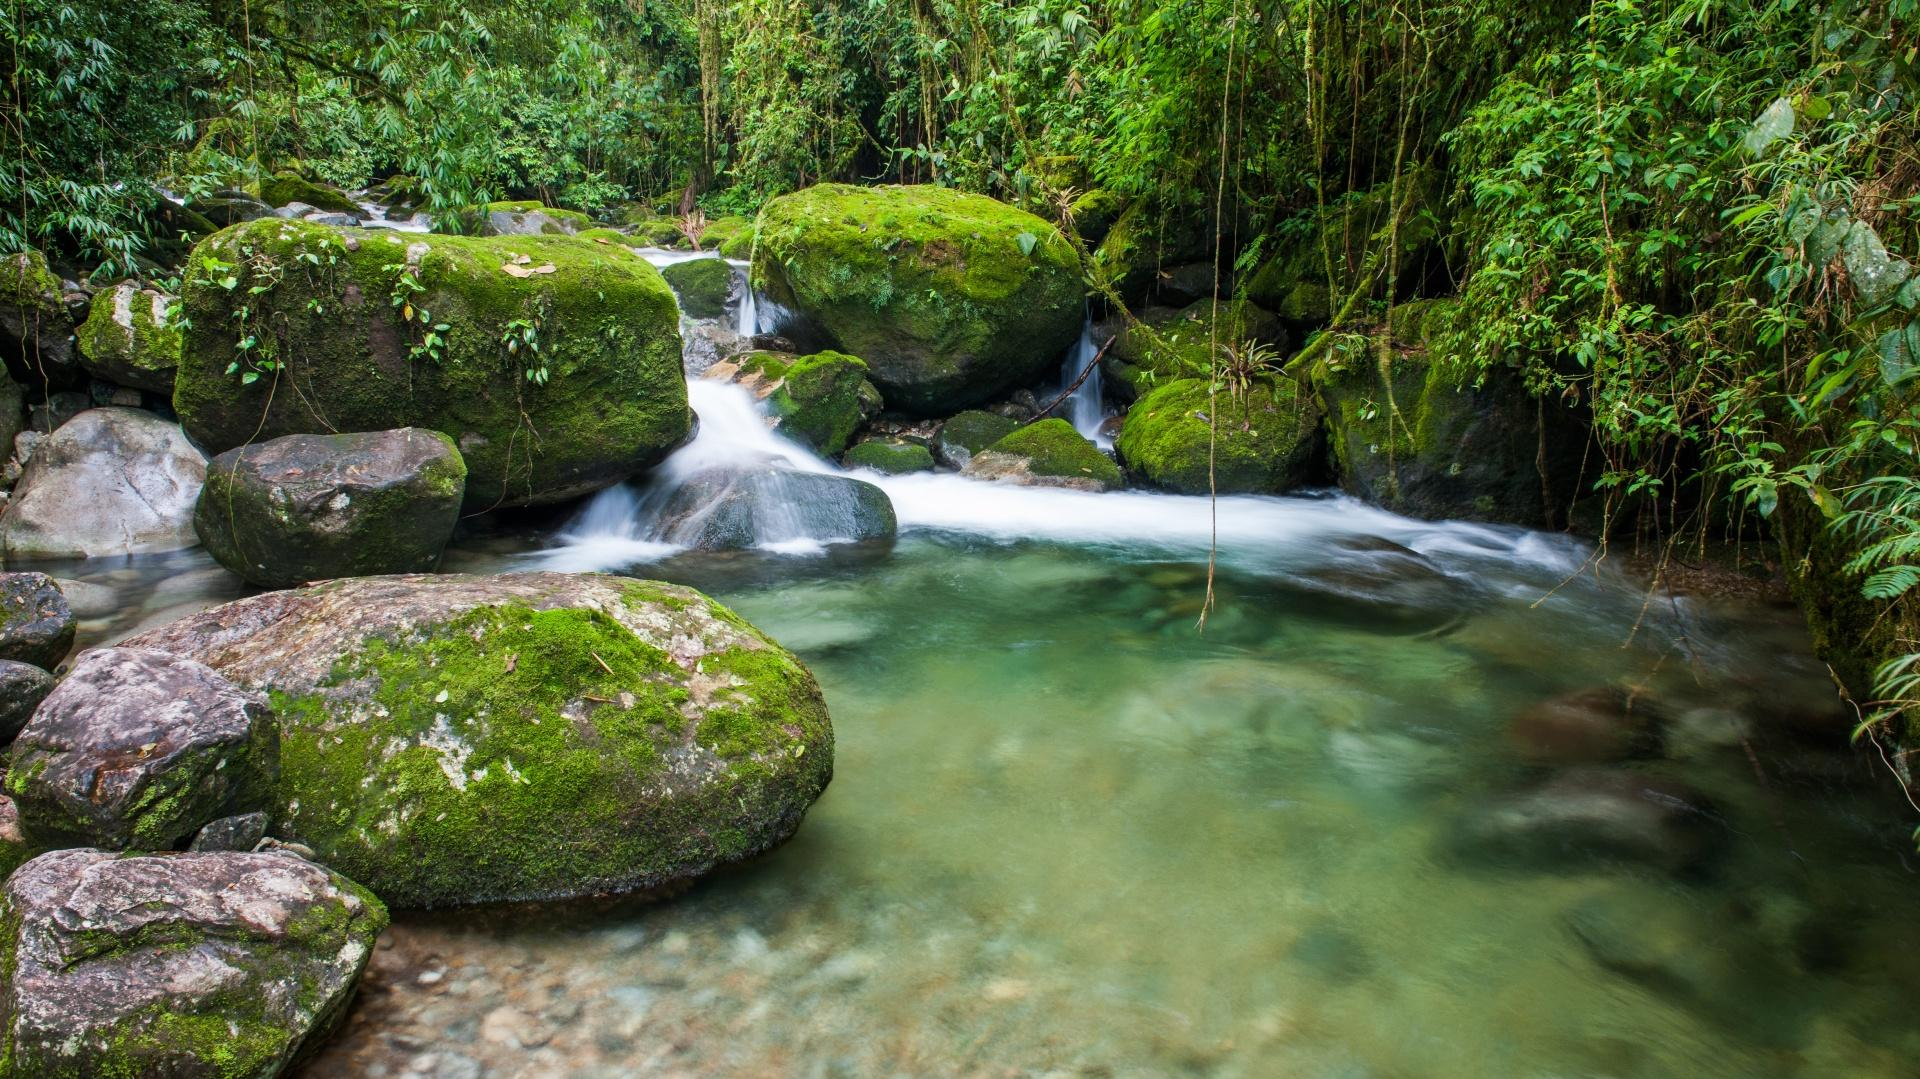 Brasilien | Rio de Janeiro, Foz do Iguacu, Estaleiro, Florianopolis, Salvador, Chapada Diamantina: 16 Tage Aktivreise durch Brasilien